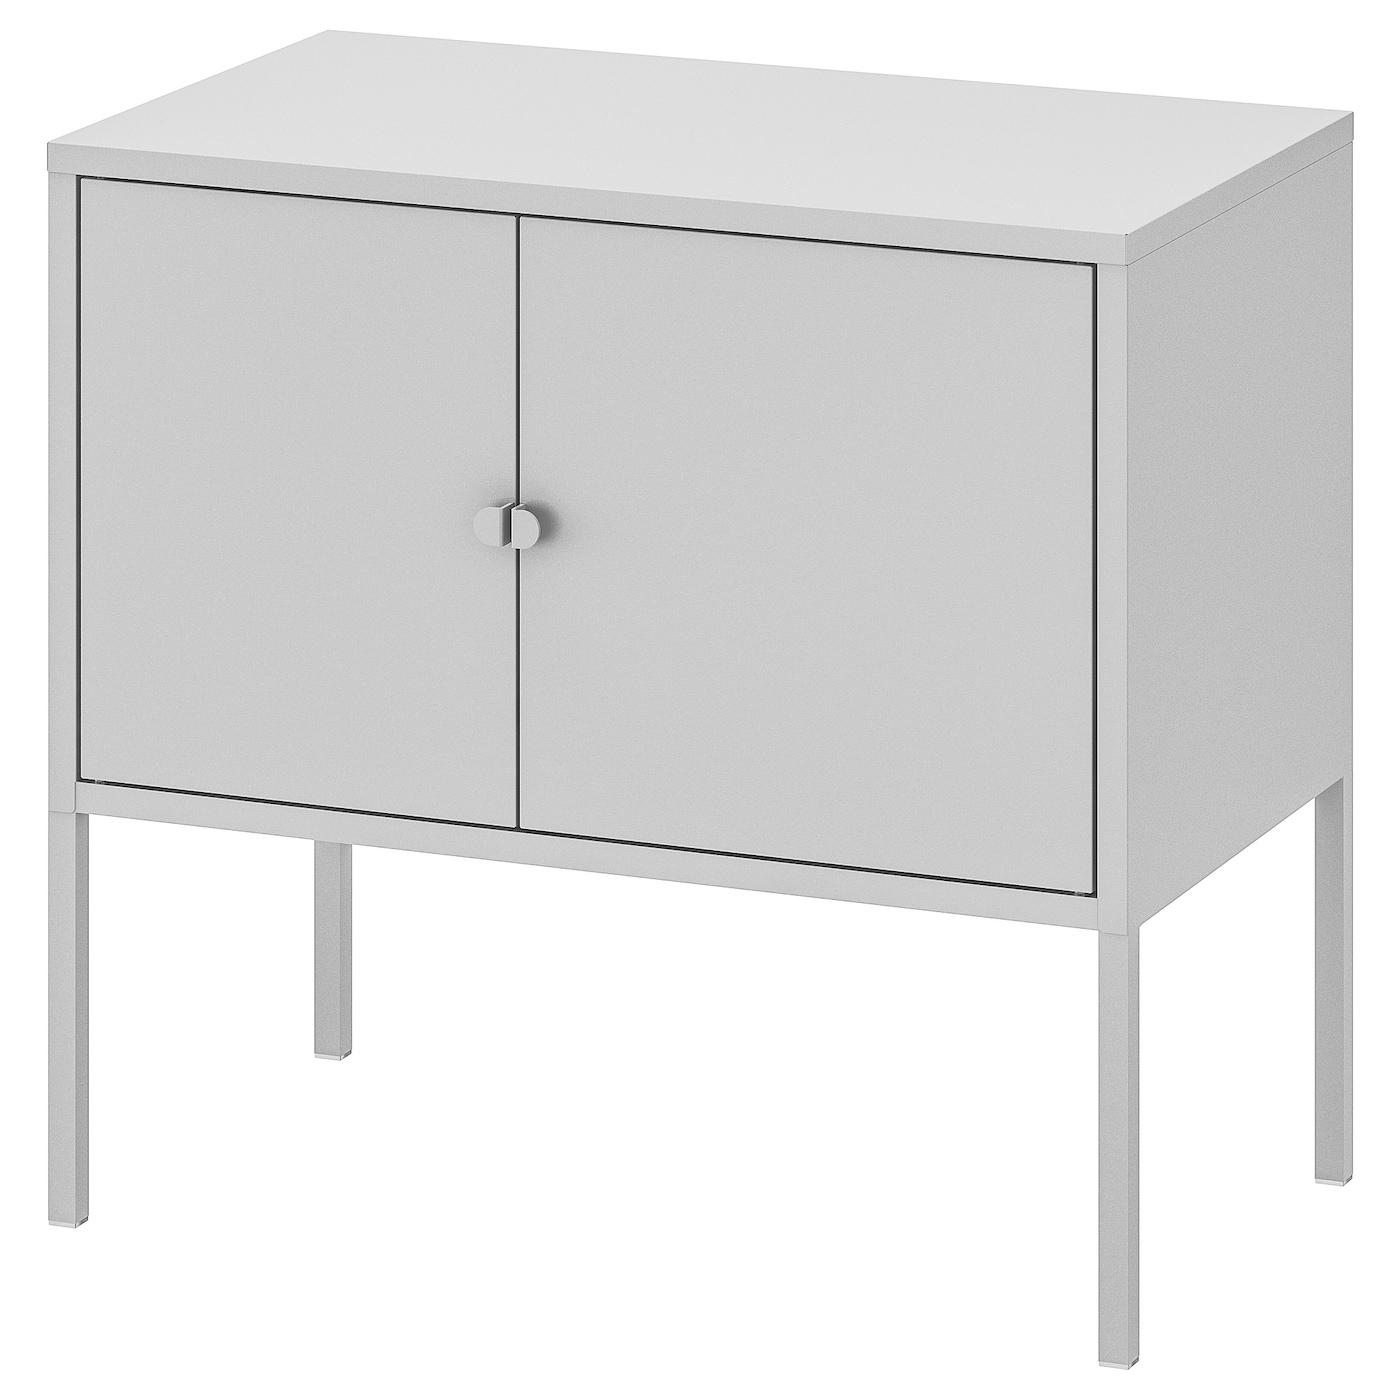 lixhult rangement m tal gris 60 x 35 cm ikea. Black Bedroom Furniture Sets. Home Design Ideas